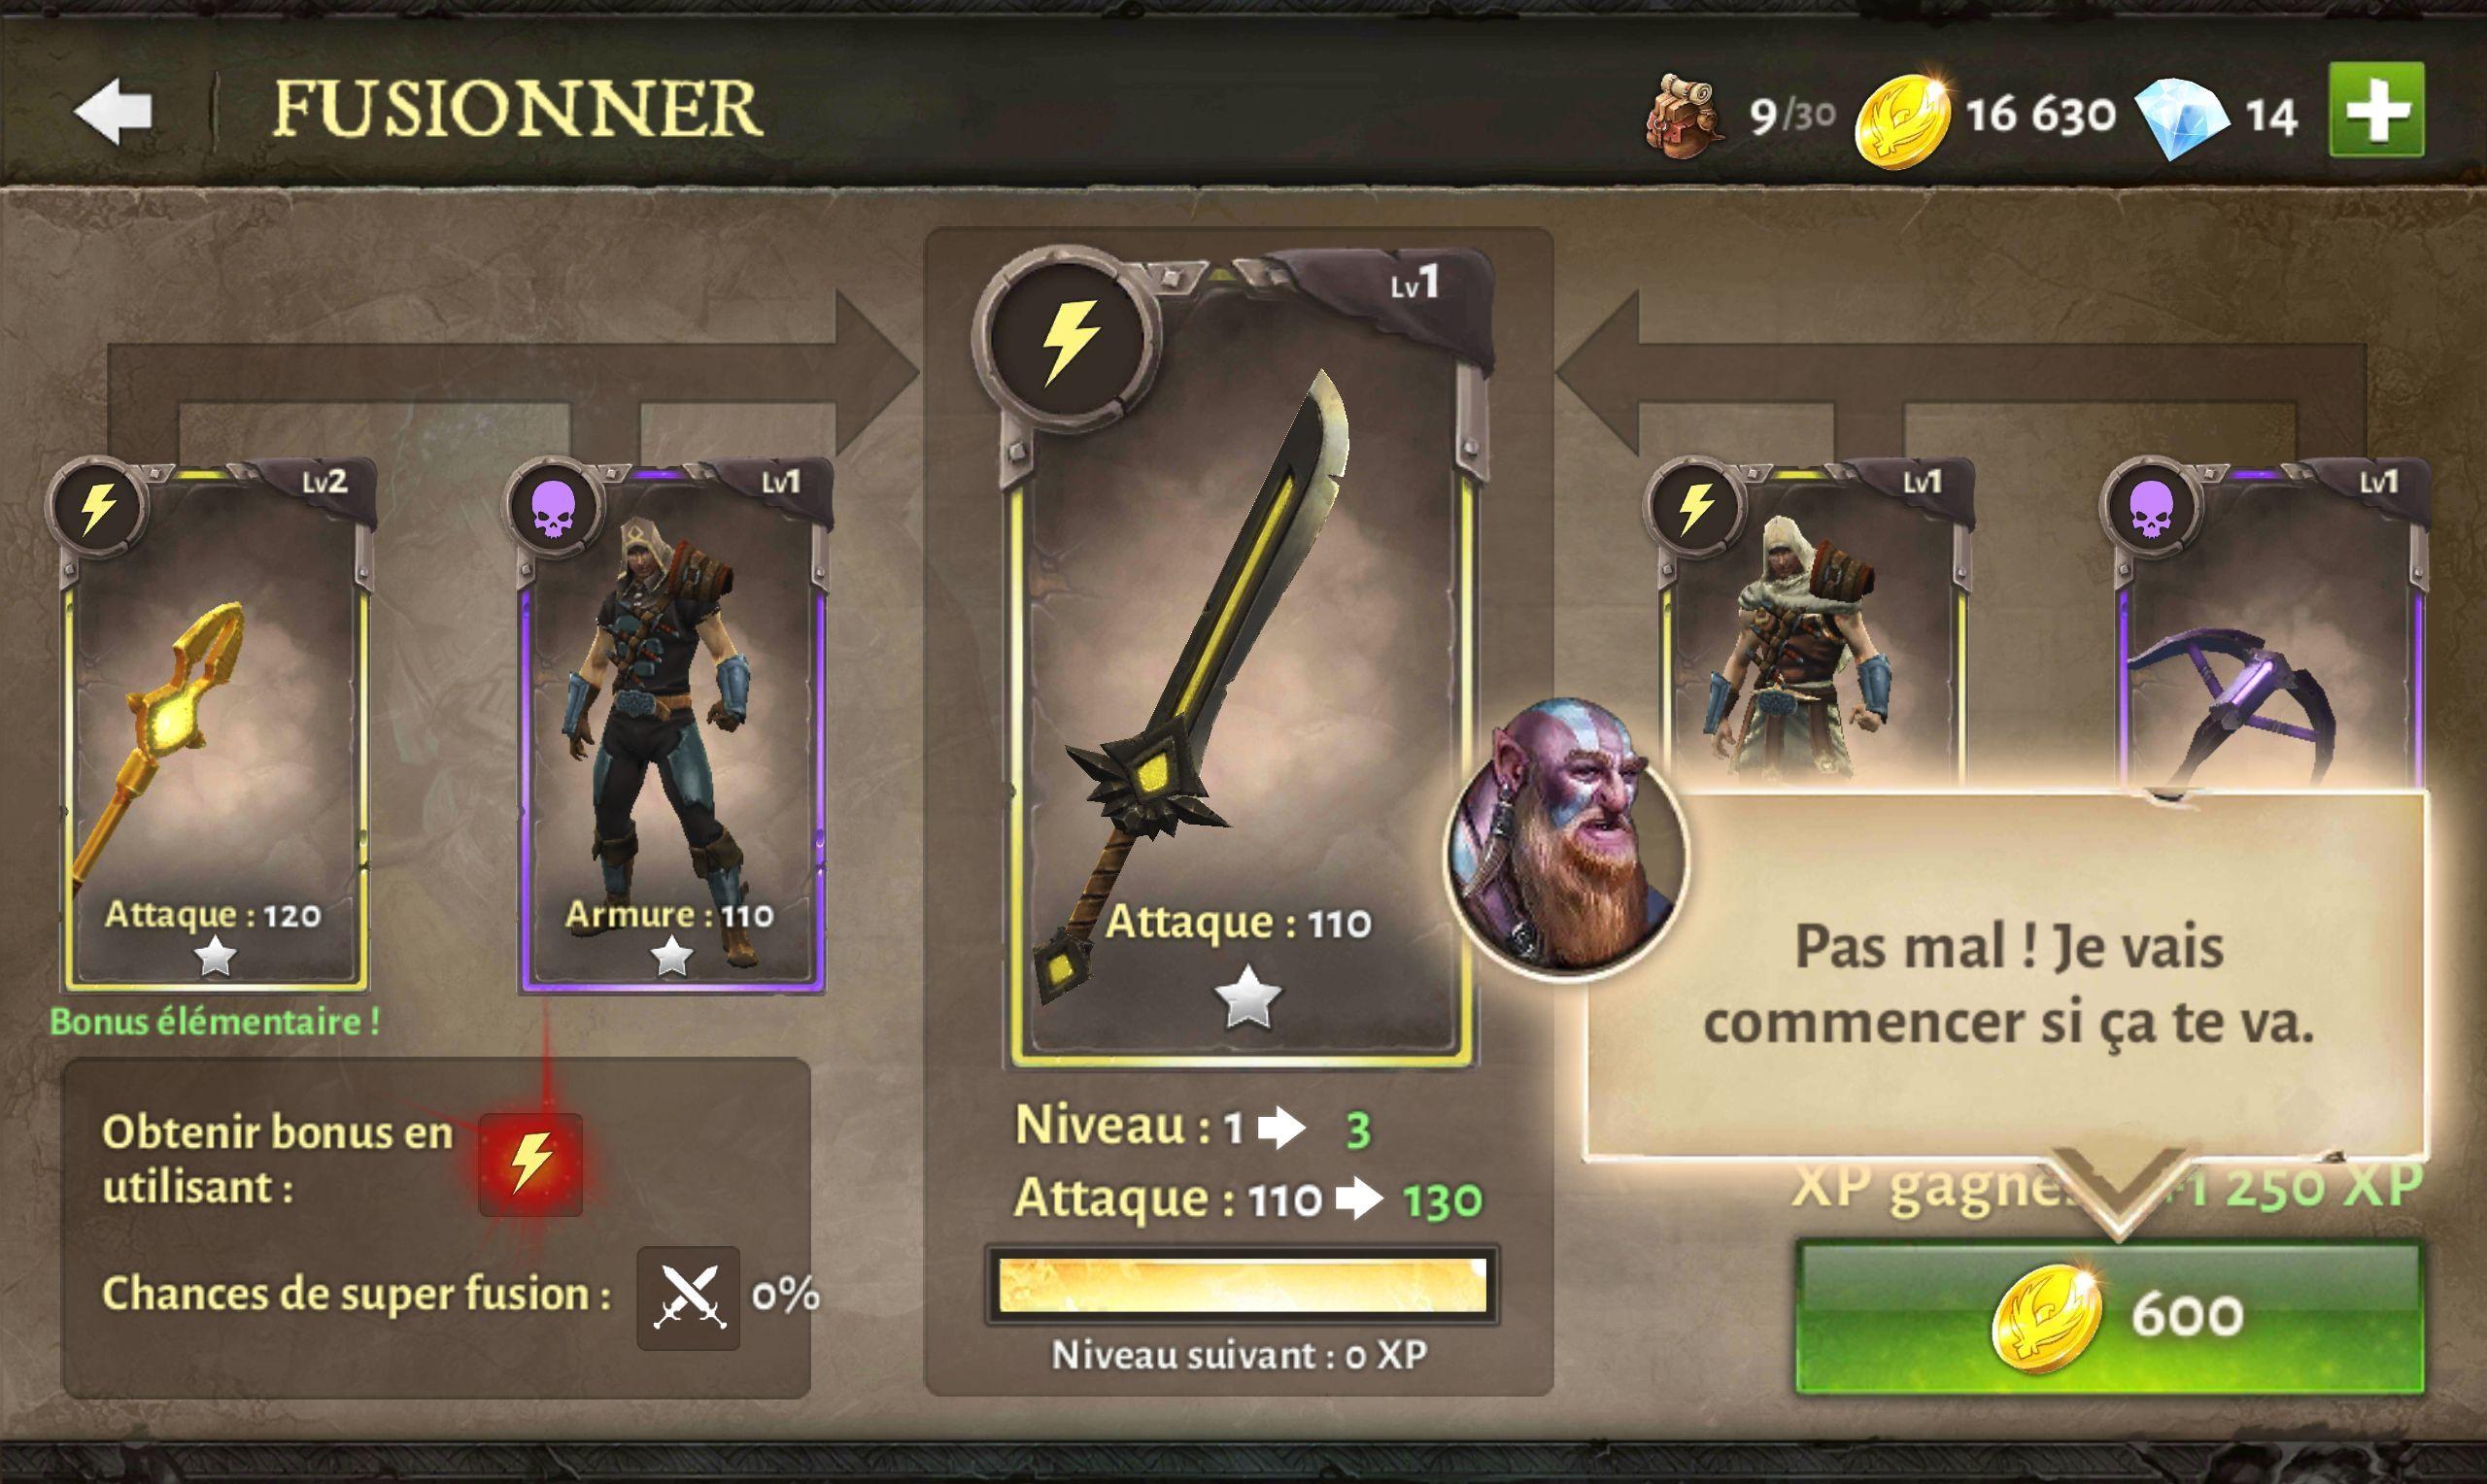 dungeon hunter 5 hack tool windows 10